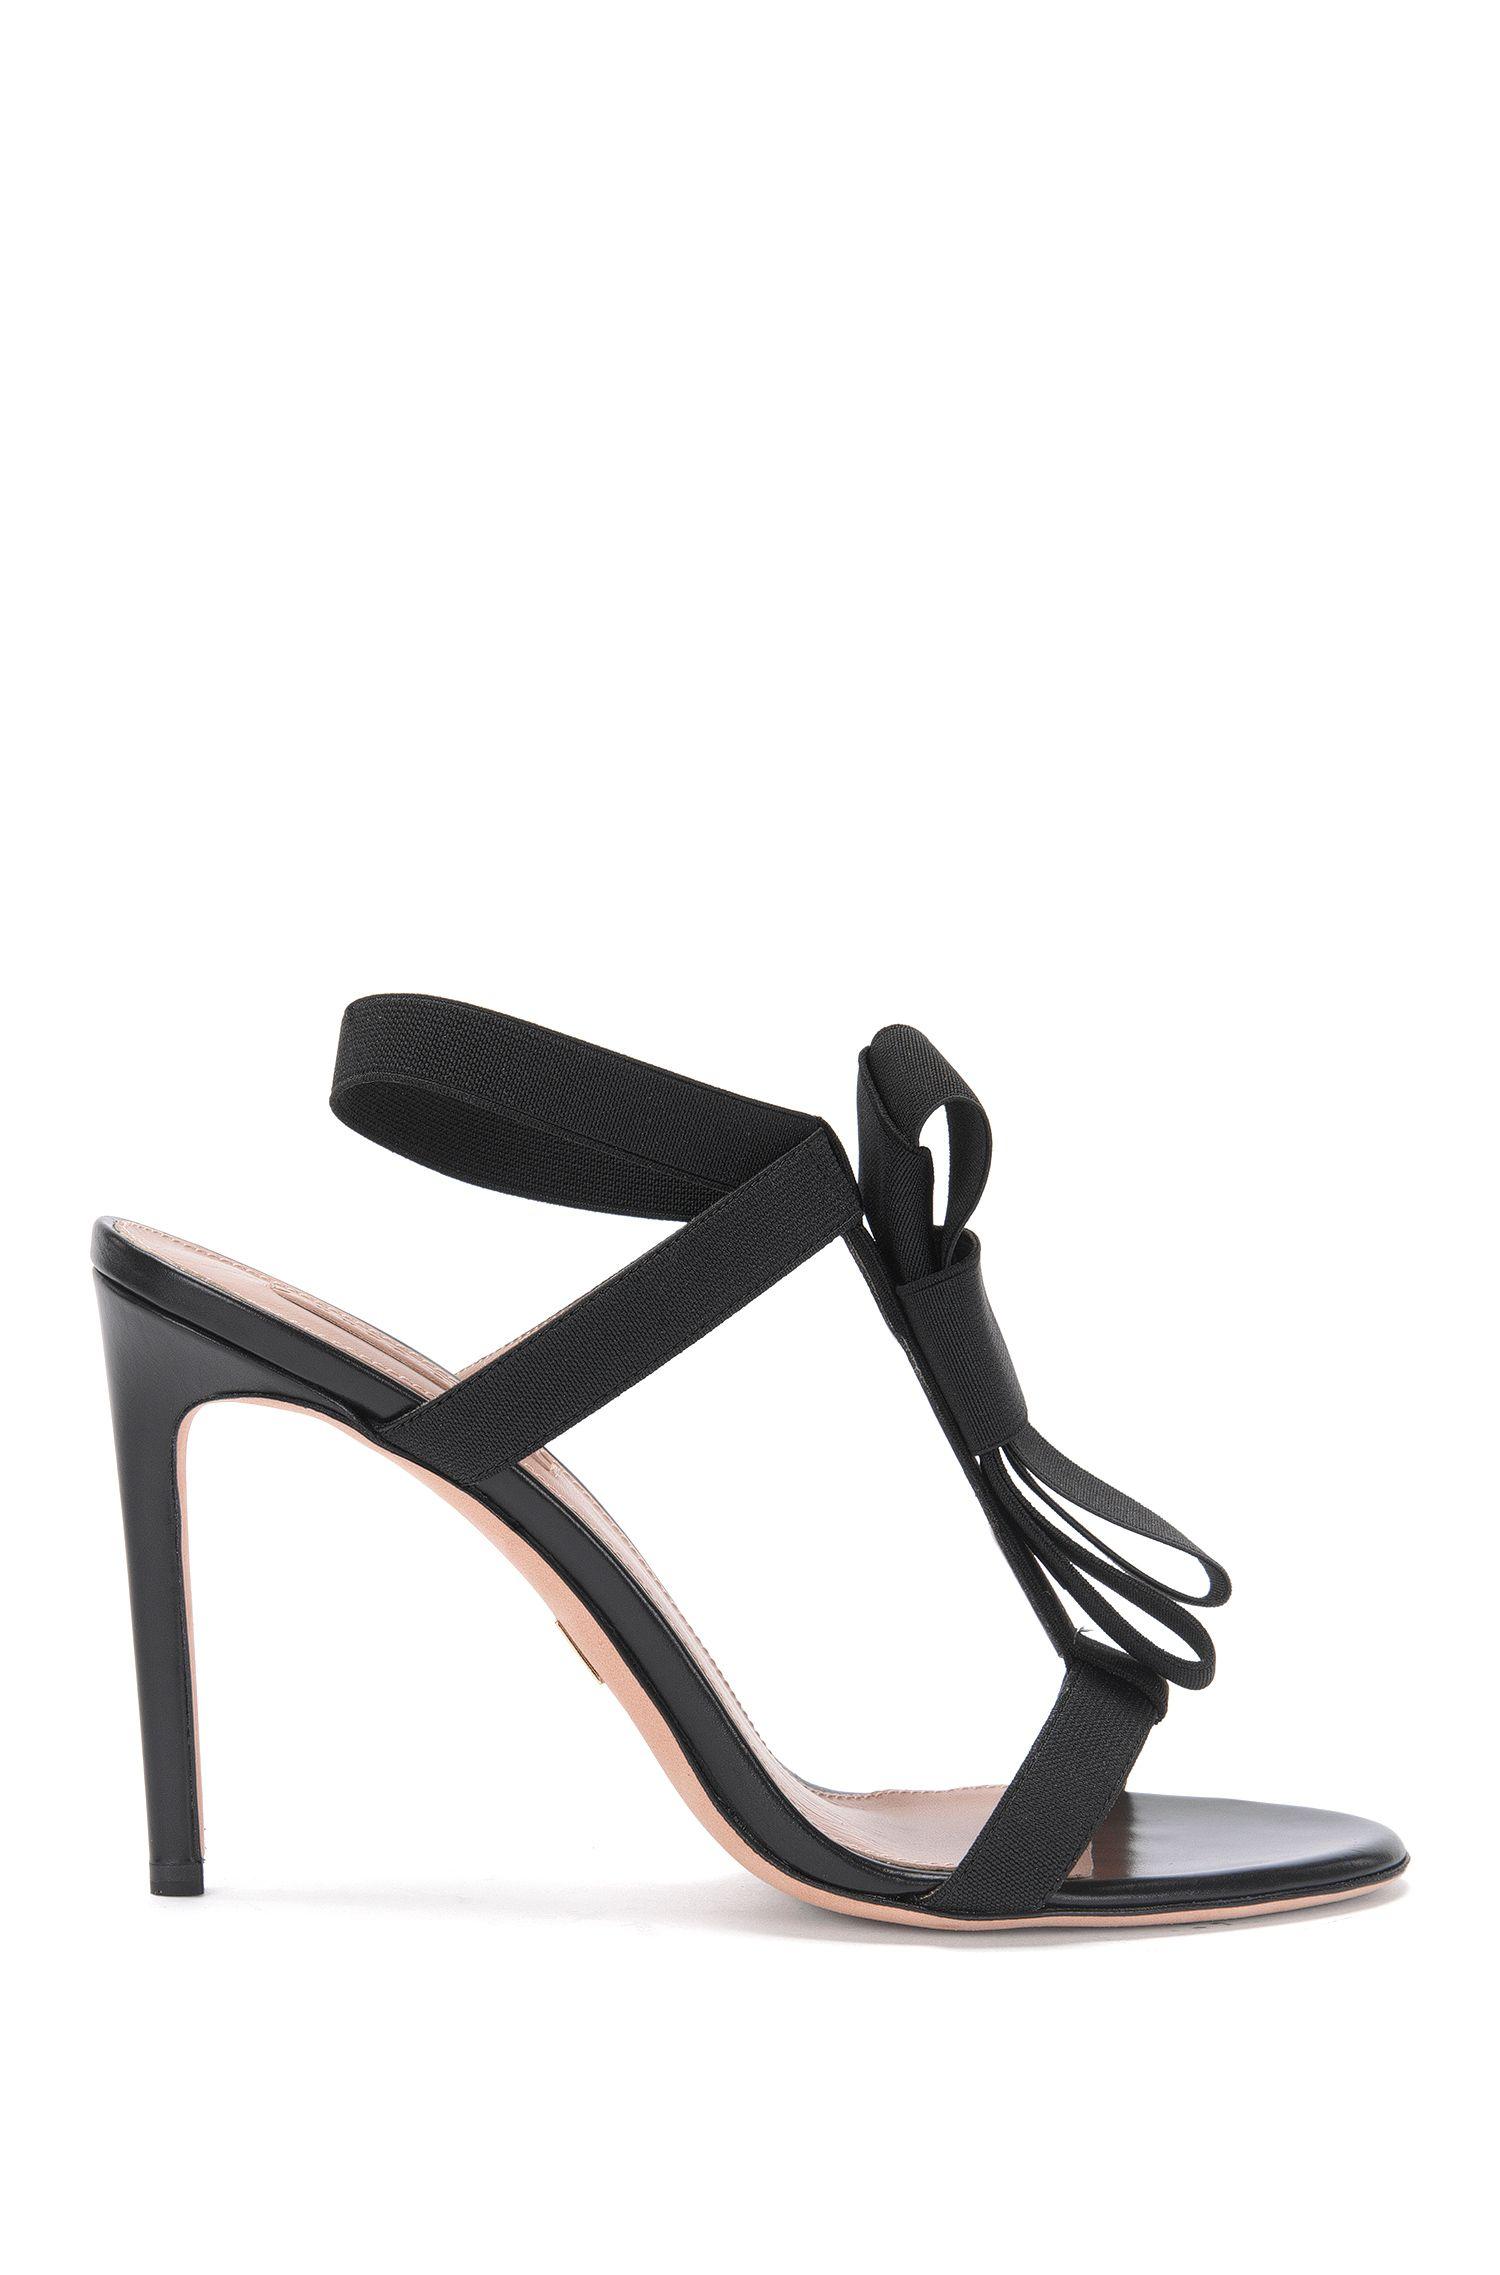 'Bow Tie Sandal' | Stretch Bow Tie Leather Sandal